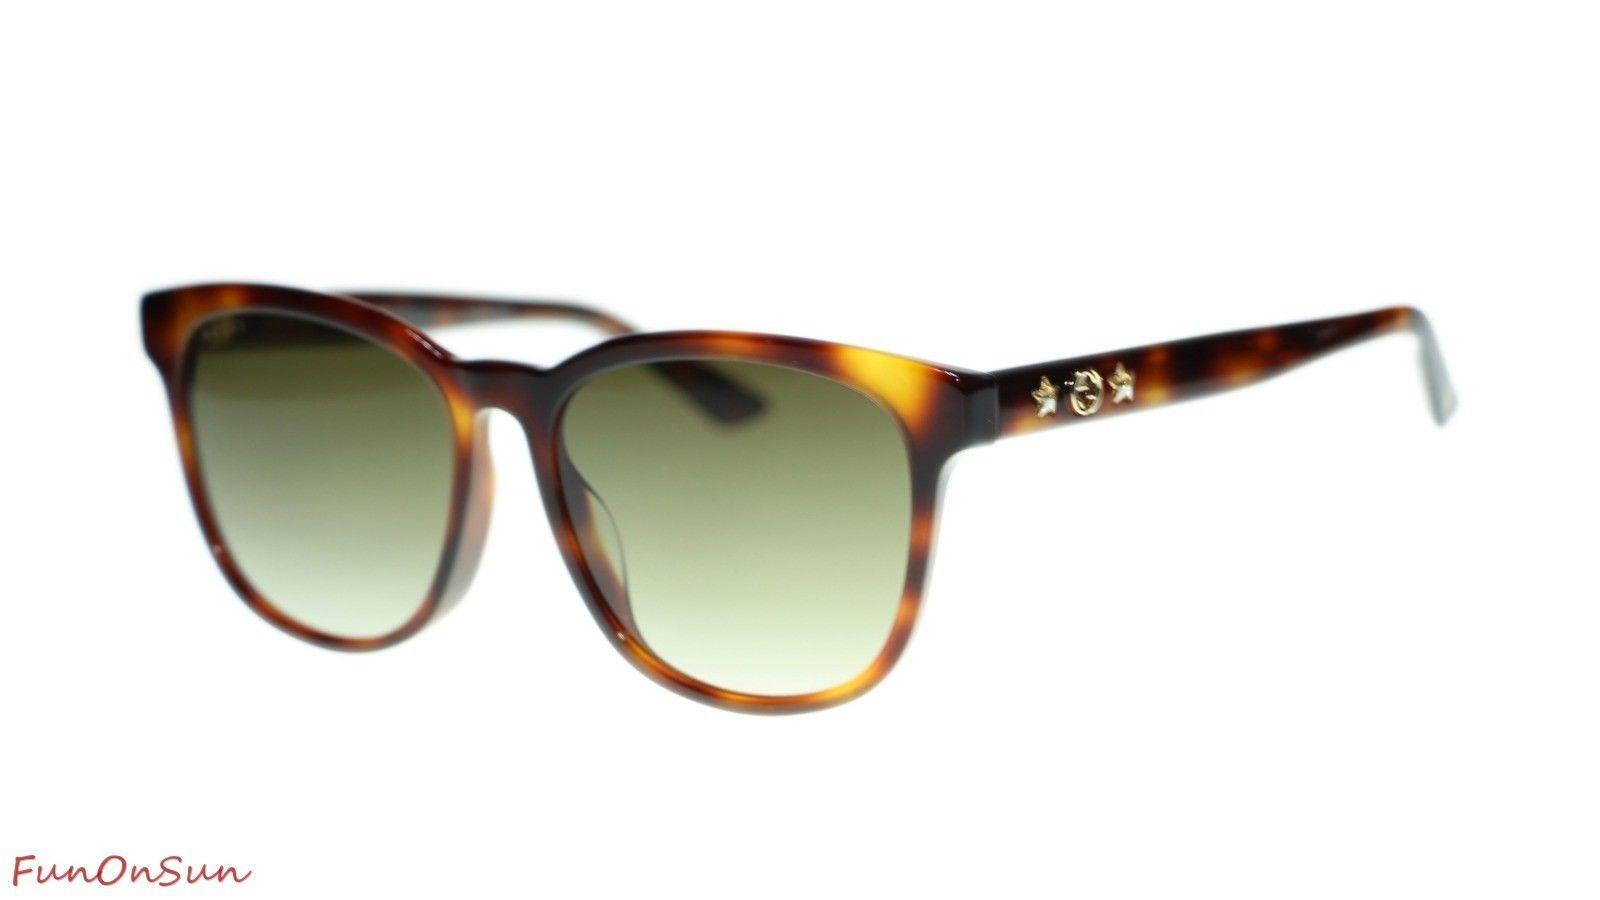 b3d411bf85 10. 10. Previous. Gucci Women s Sunglasses GG0232SK 003 Havana Brown  Gradient Lens Oval 56mm. Gucci ...